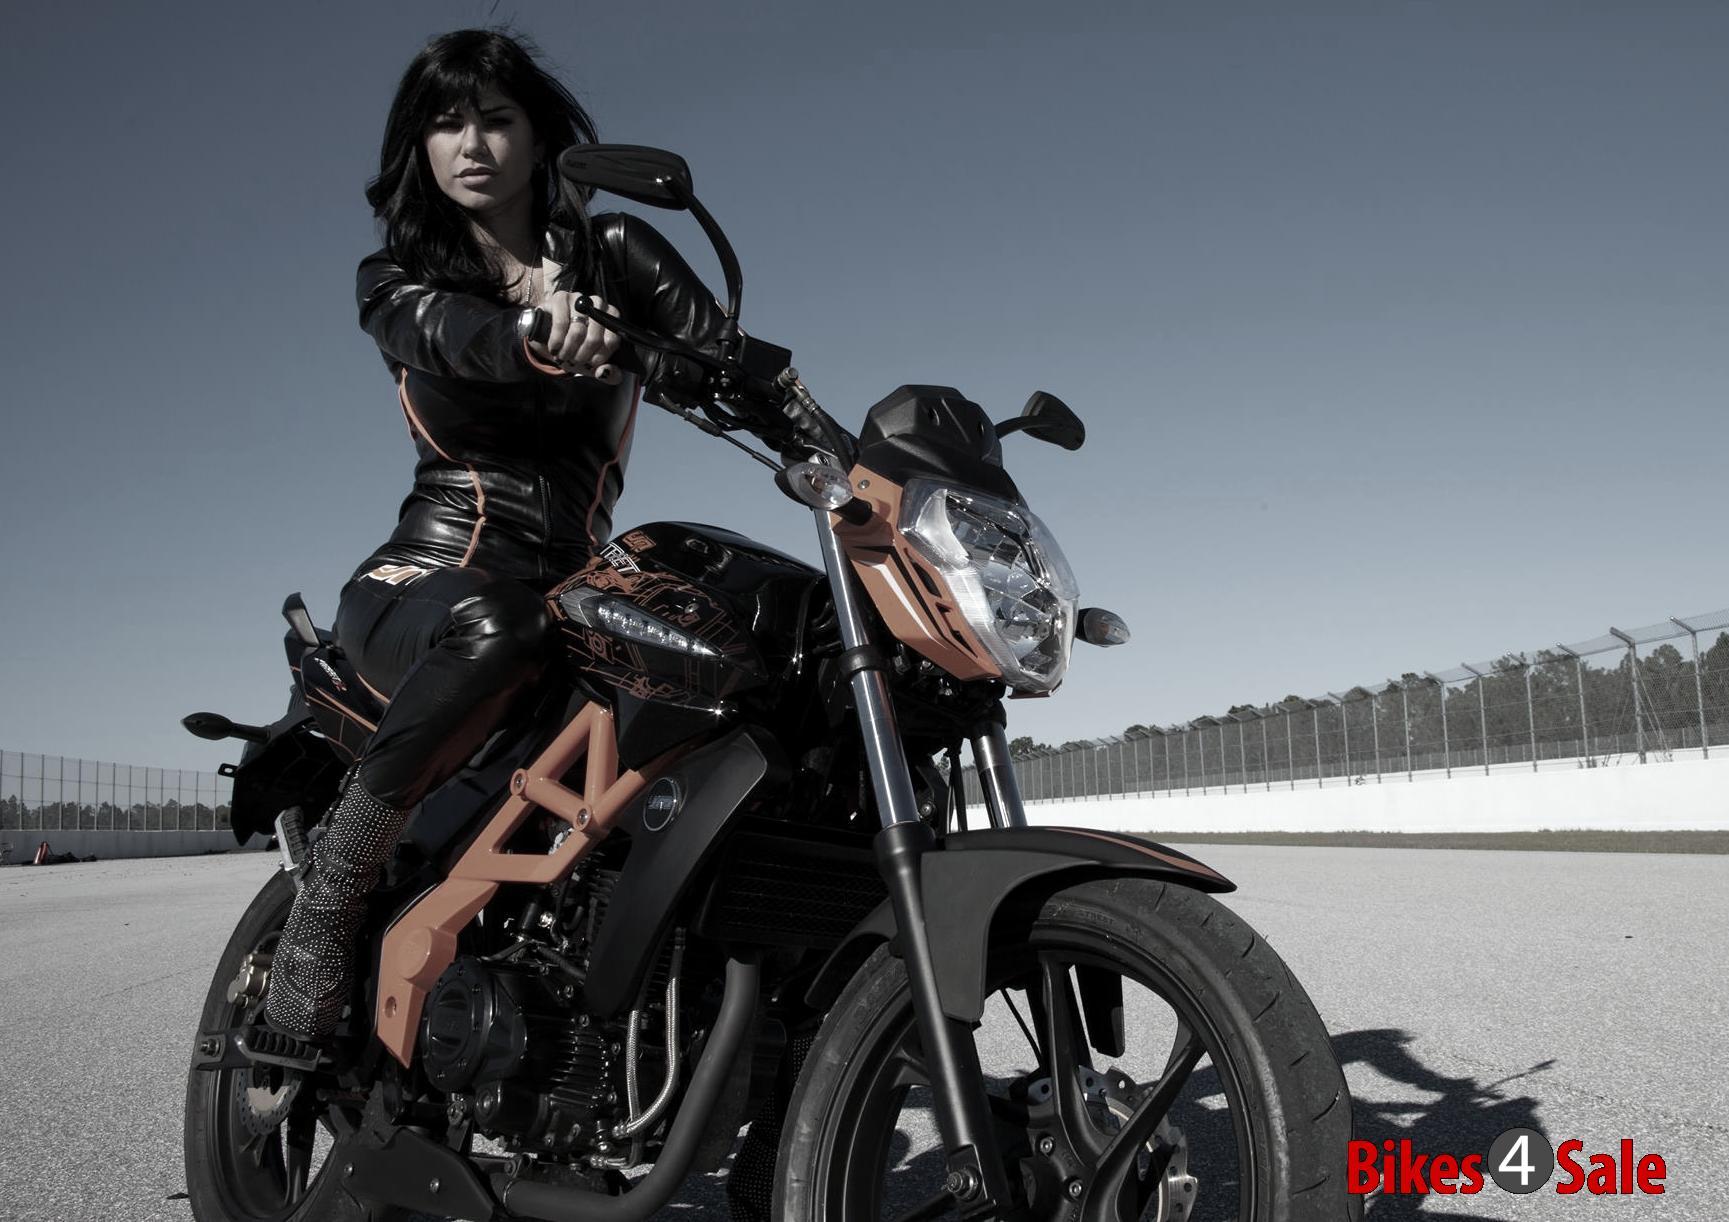 Motorcycle Girl In Beautiful Biker Jacket Um Xtreet 230 R Motorcycle Picture G Bikes4sale